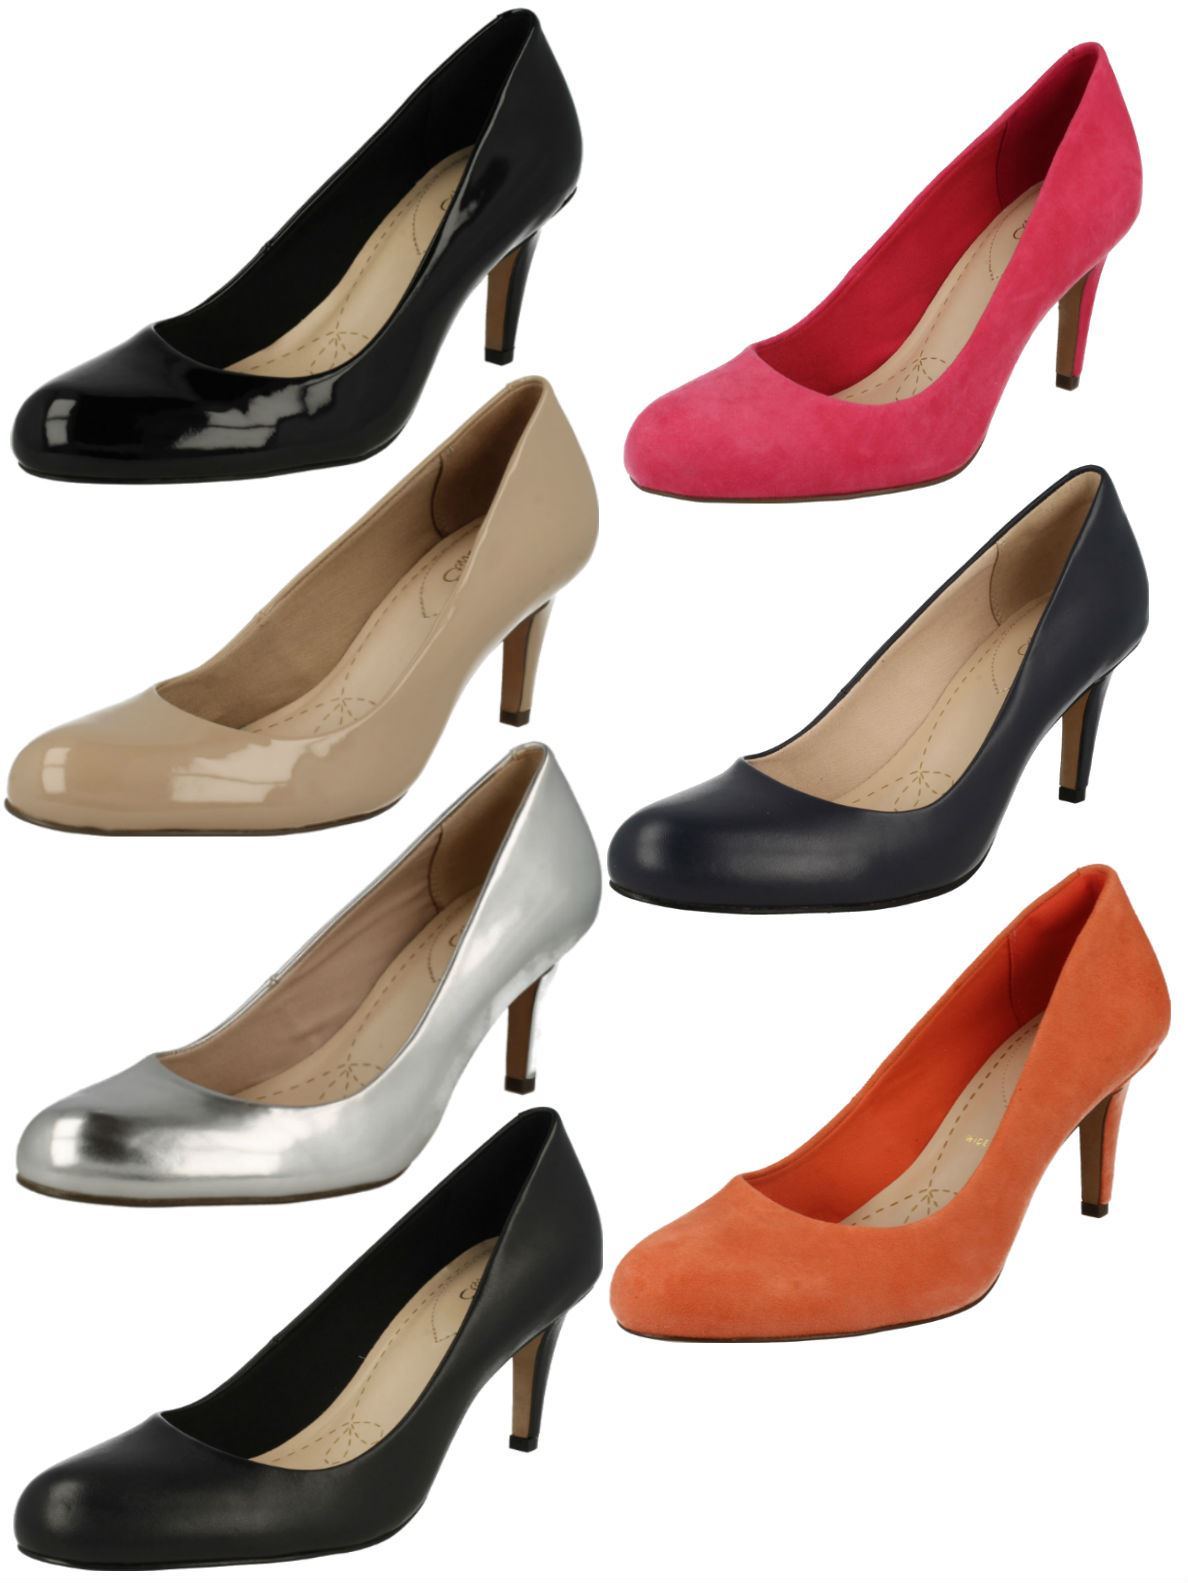 Ladies Clarks Fashion Court Shoes 'Carlita Cove'